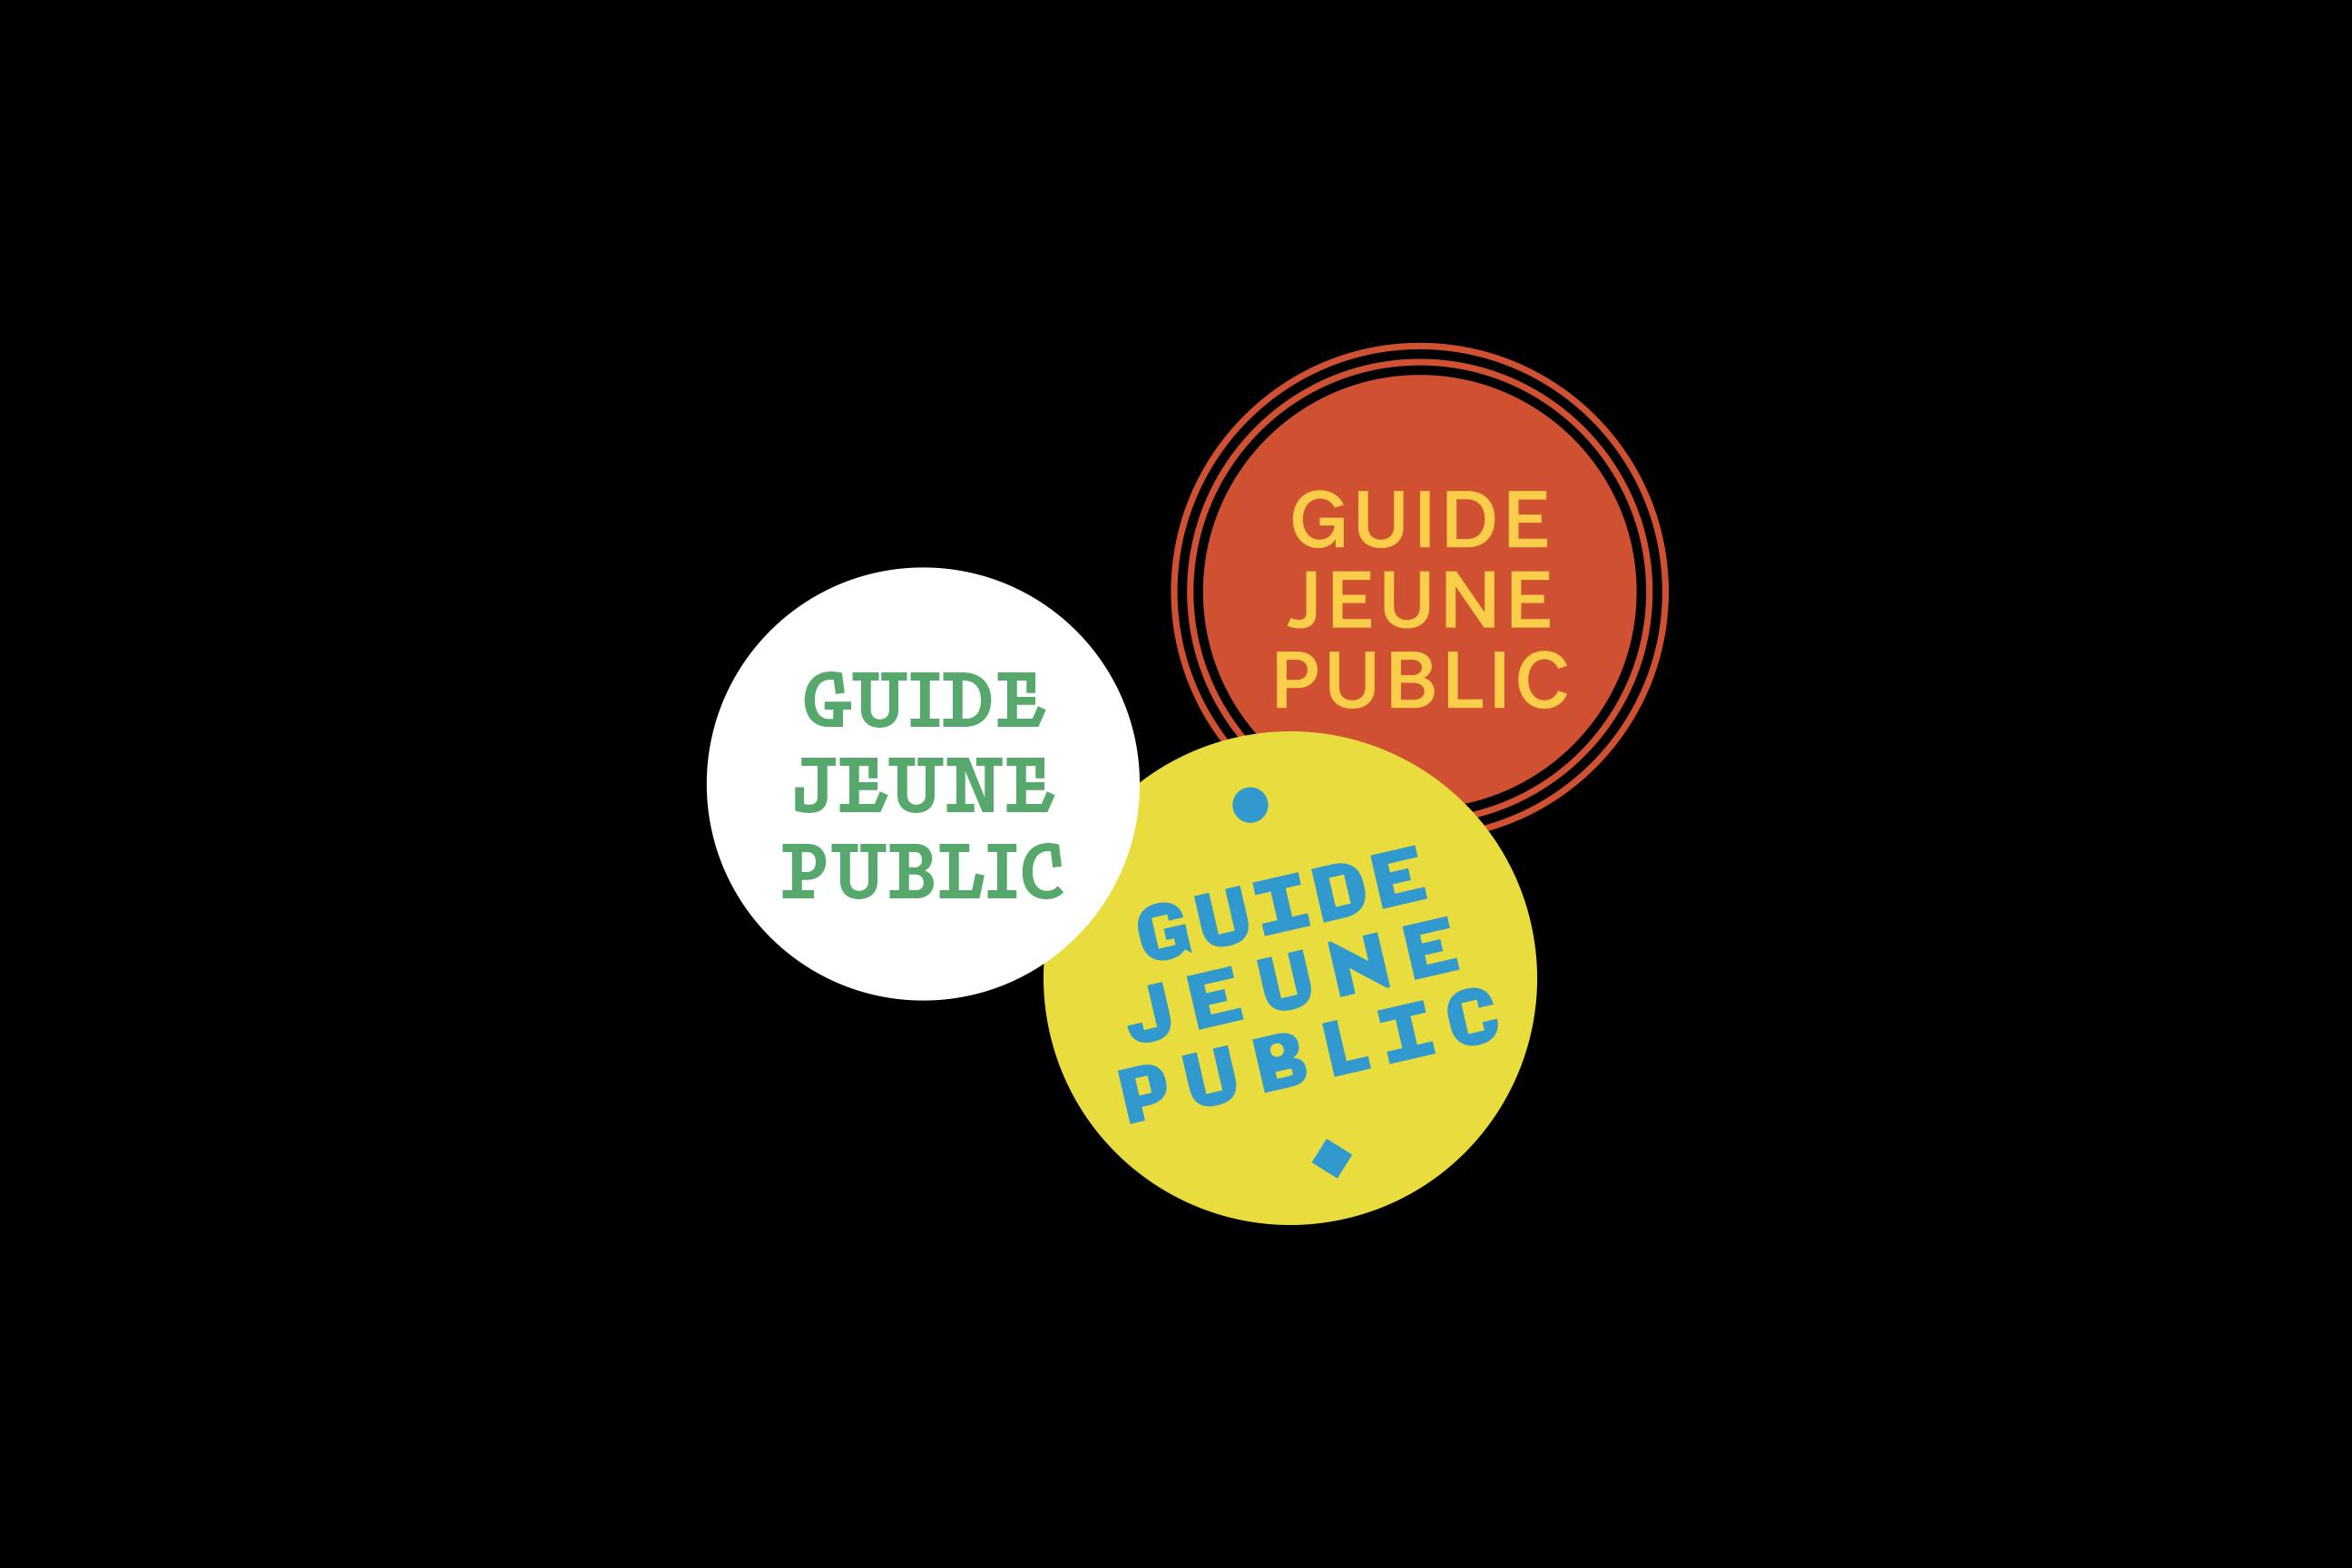 Guide jeune public Fondation Cartier